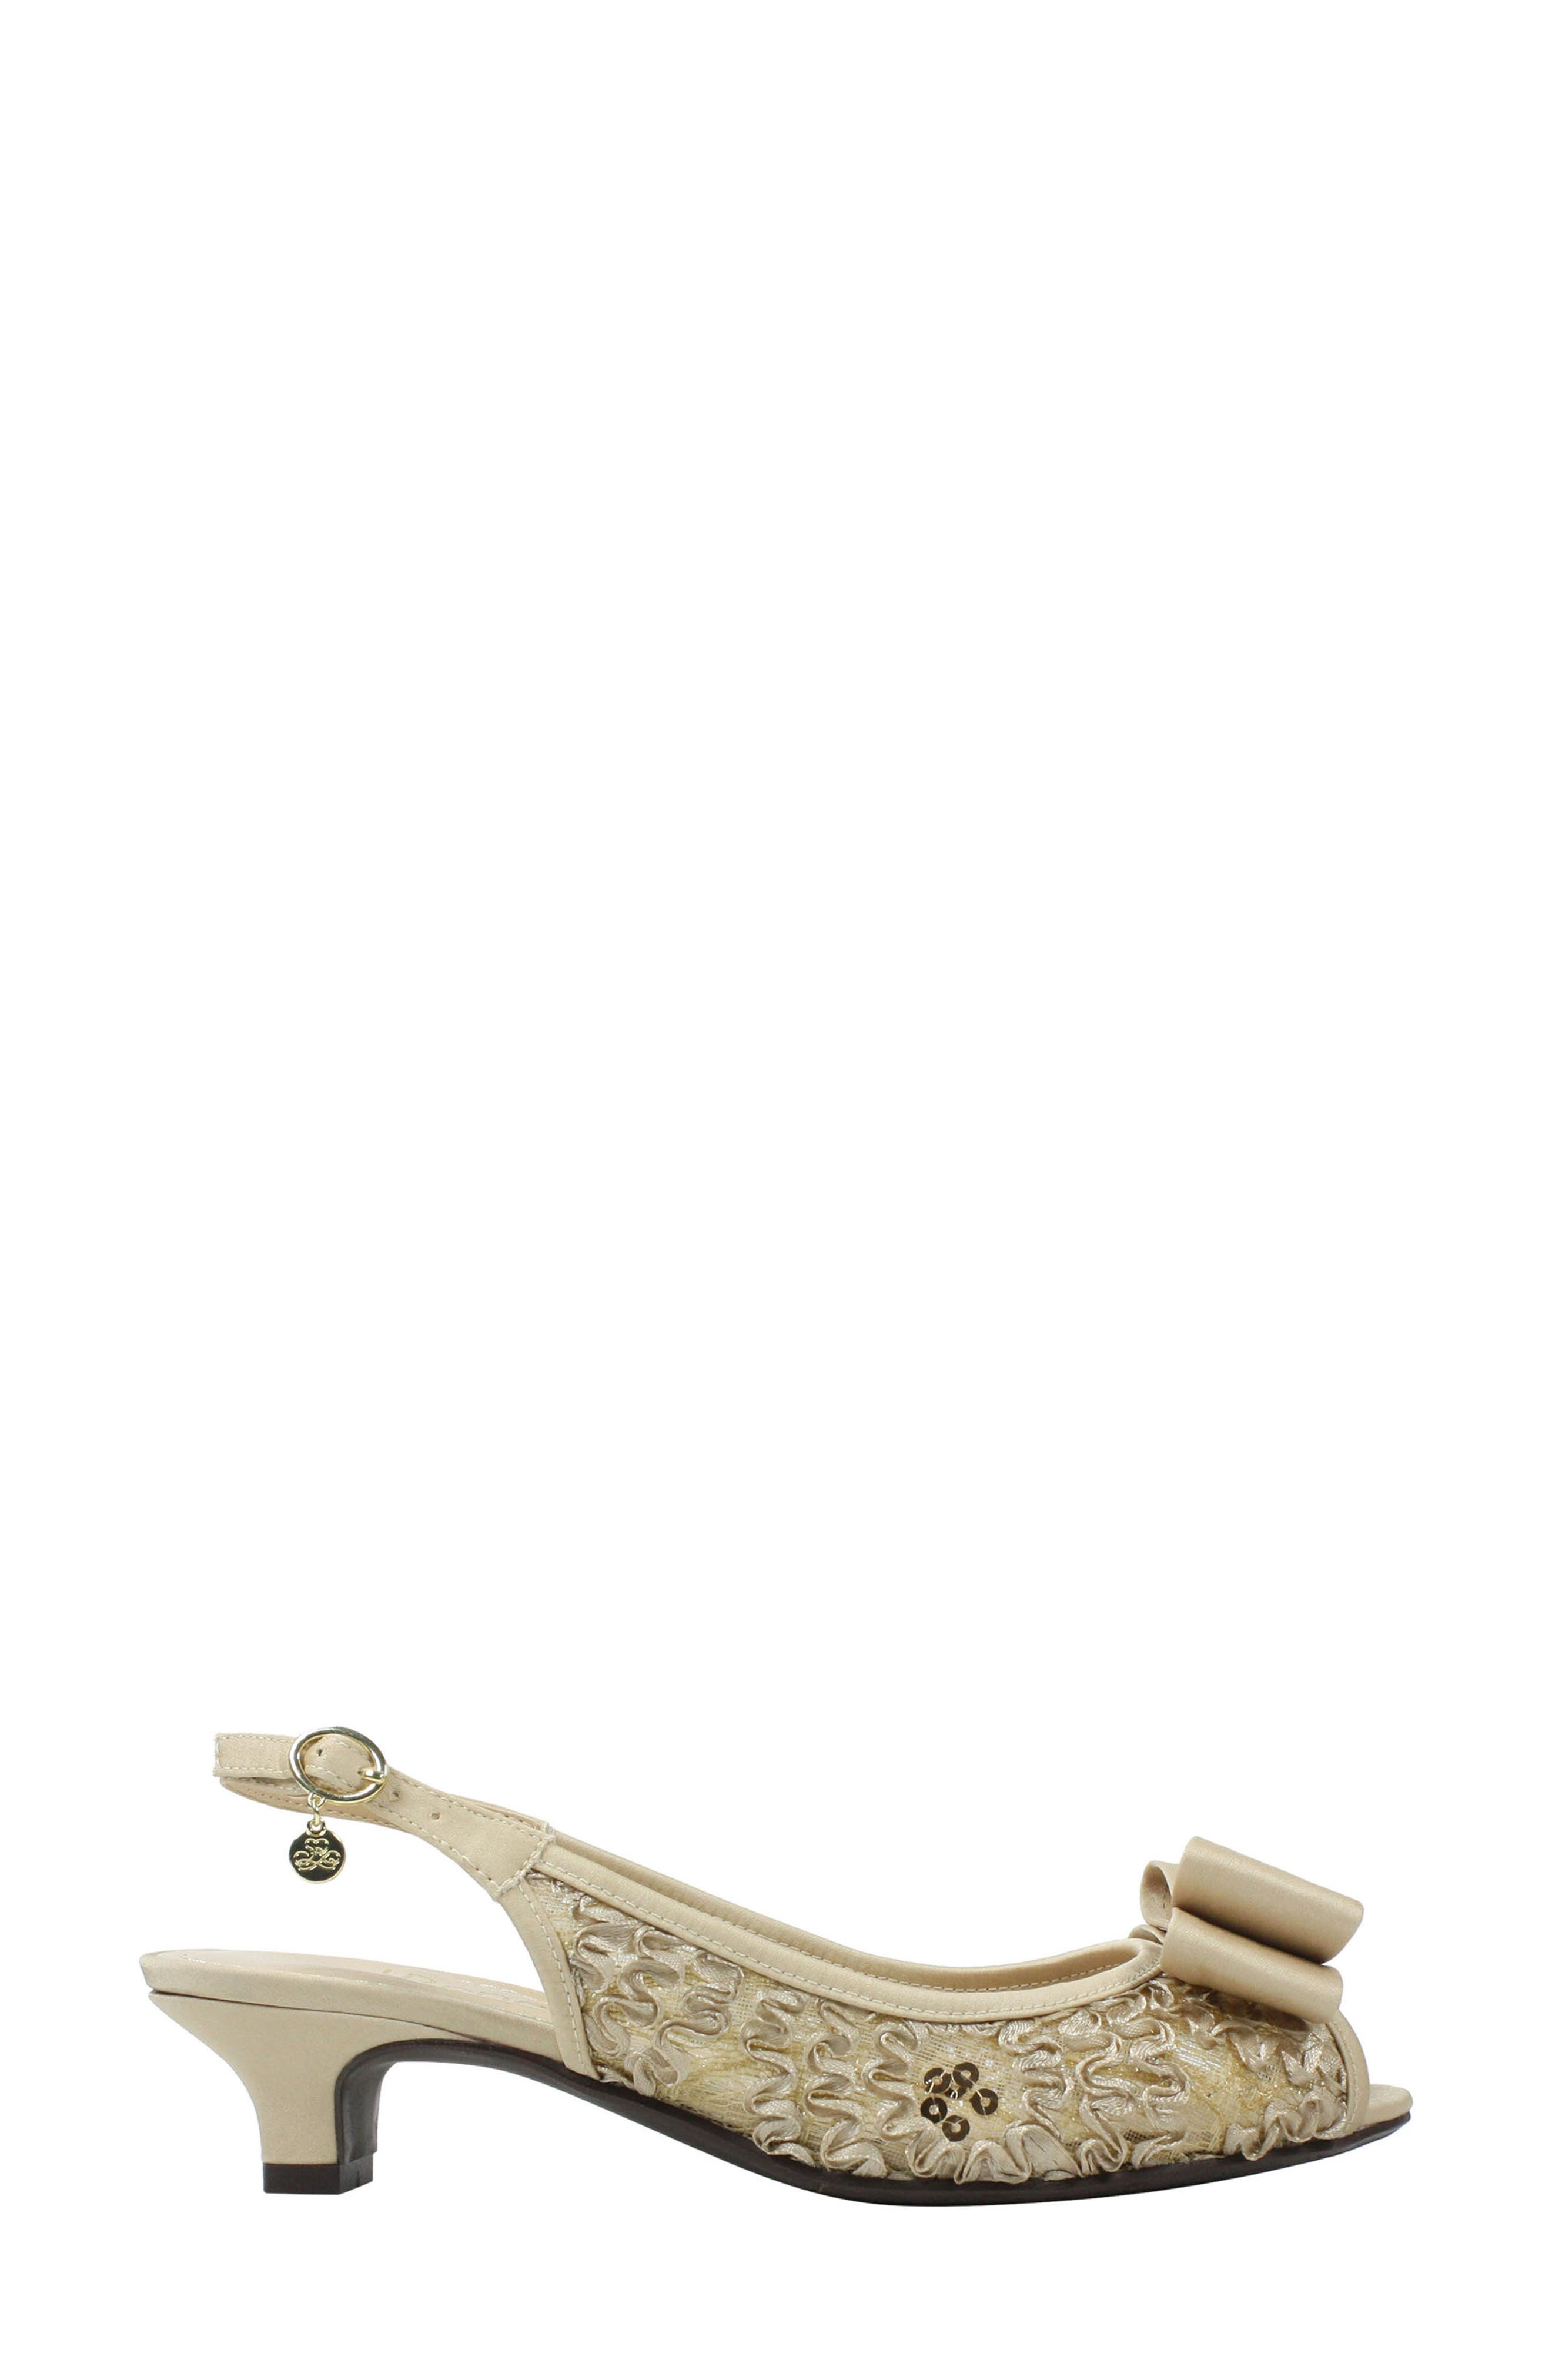 Landan Bow Slingback Sandal,                             Alternate thumbnail 3, color,                             Champagne